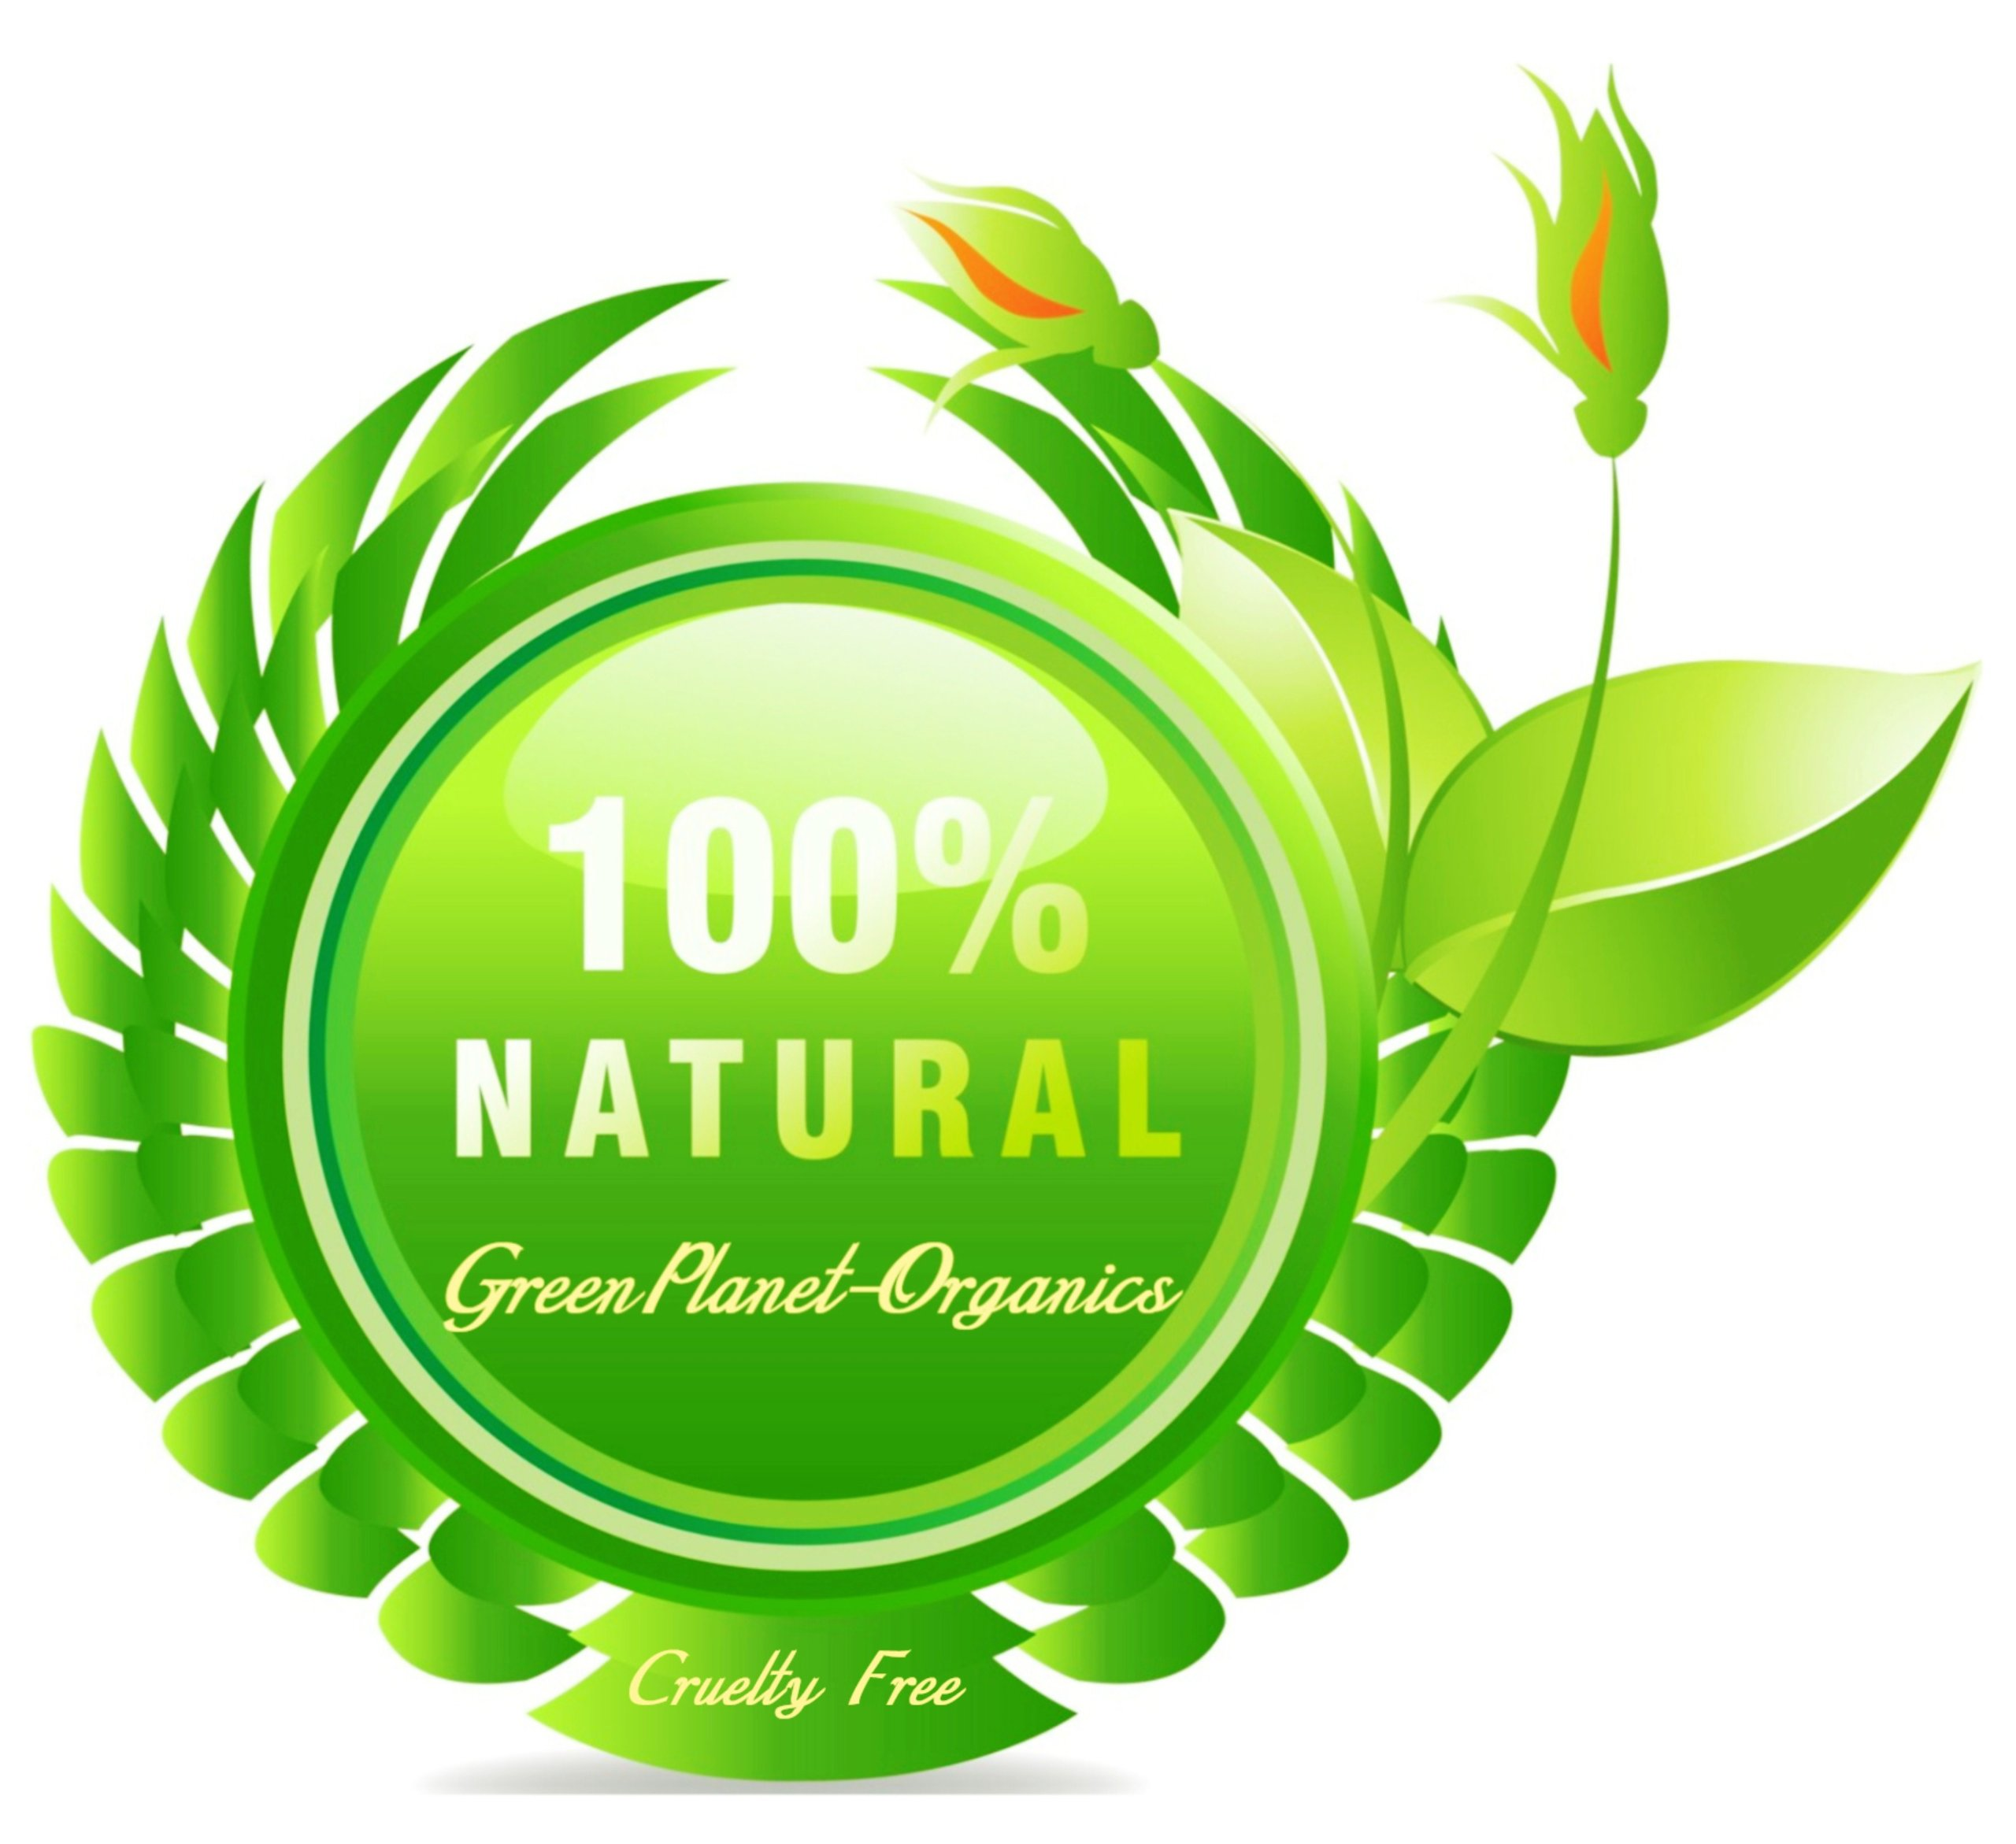 2 LBS Natural & Halal Tukh Malanga/Sabza/Sabja Seeds (Make Delicious Rooh Afza Drinks/Falooda Ice Creams, Tokhme Sharbats, Basil Drinks, Basil Jellos/Puddings)